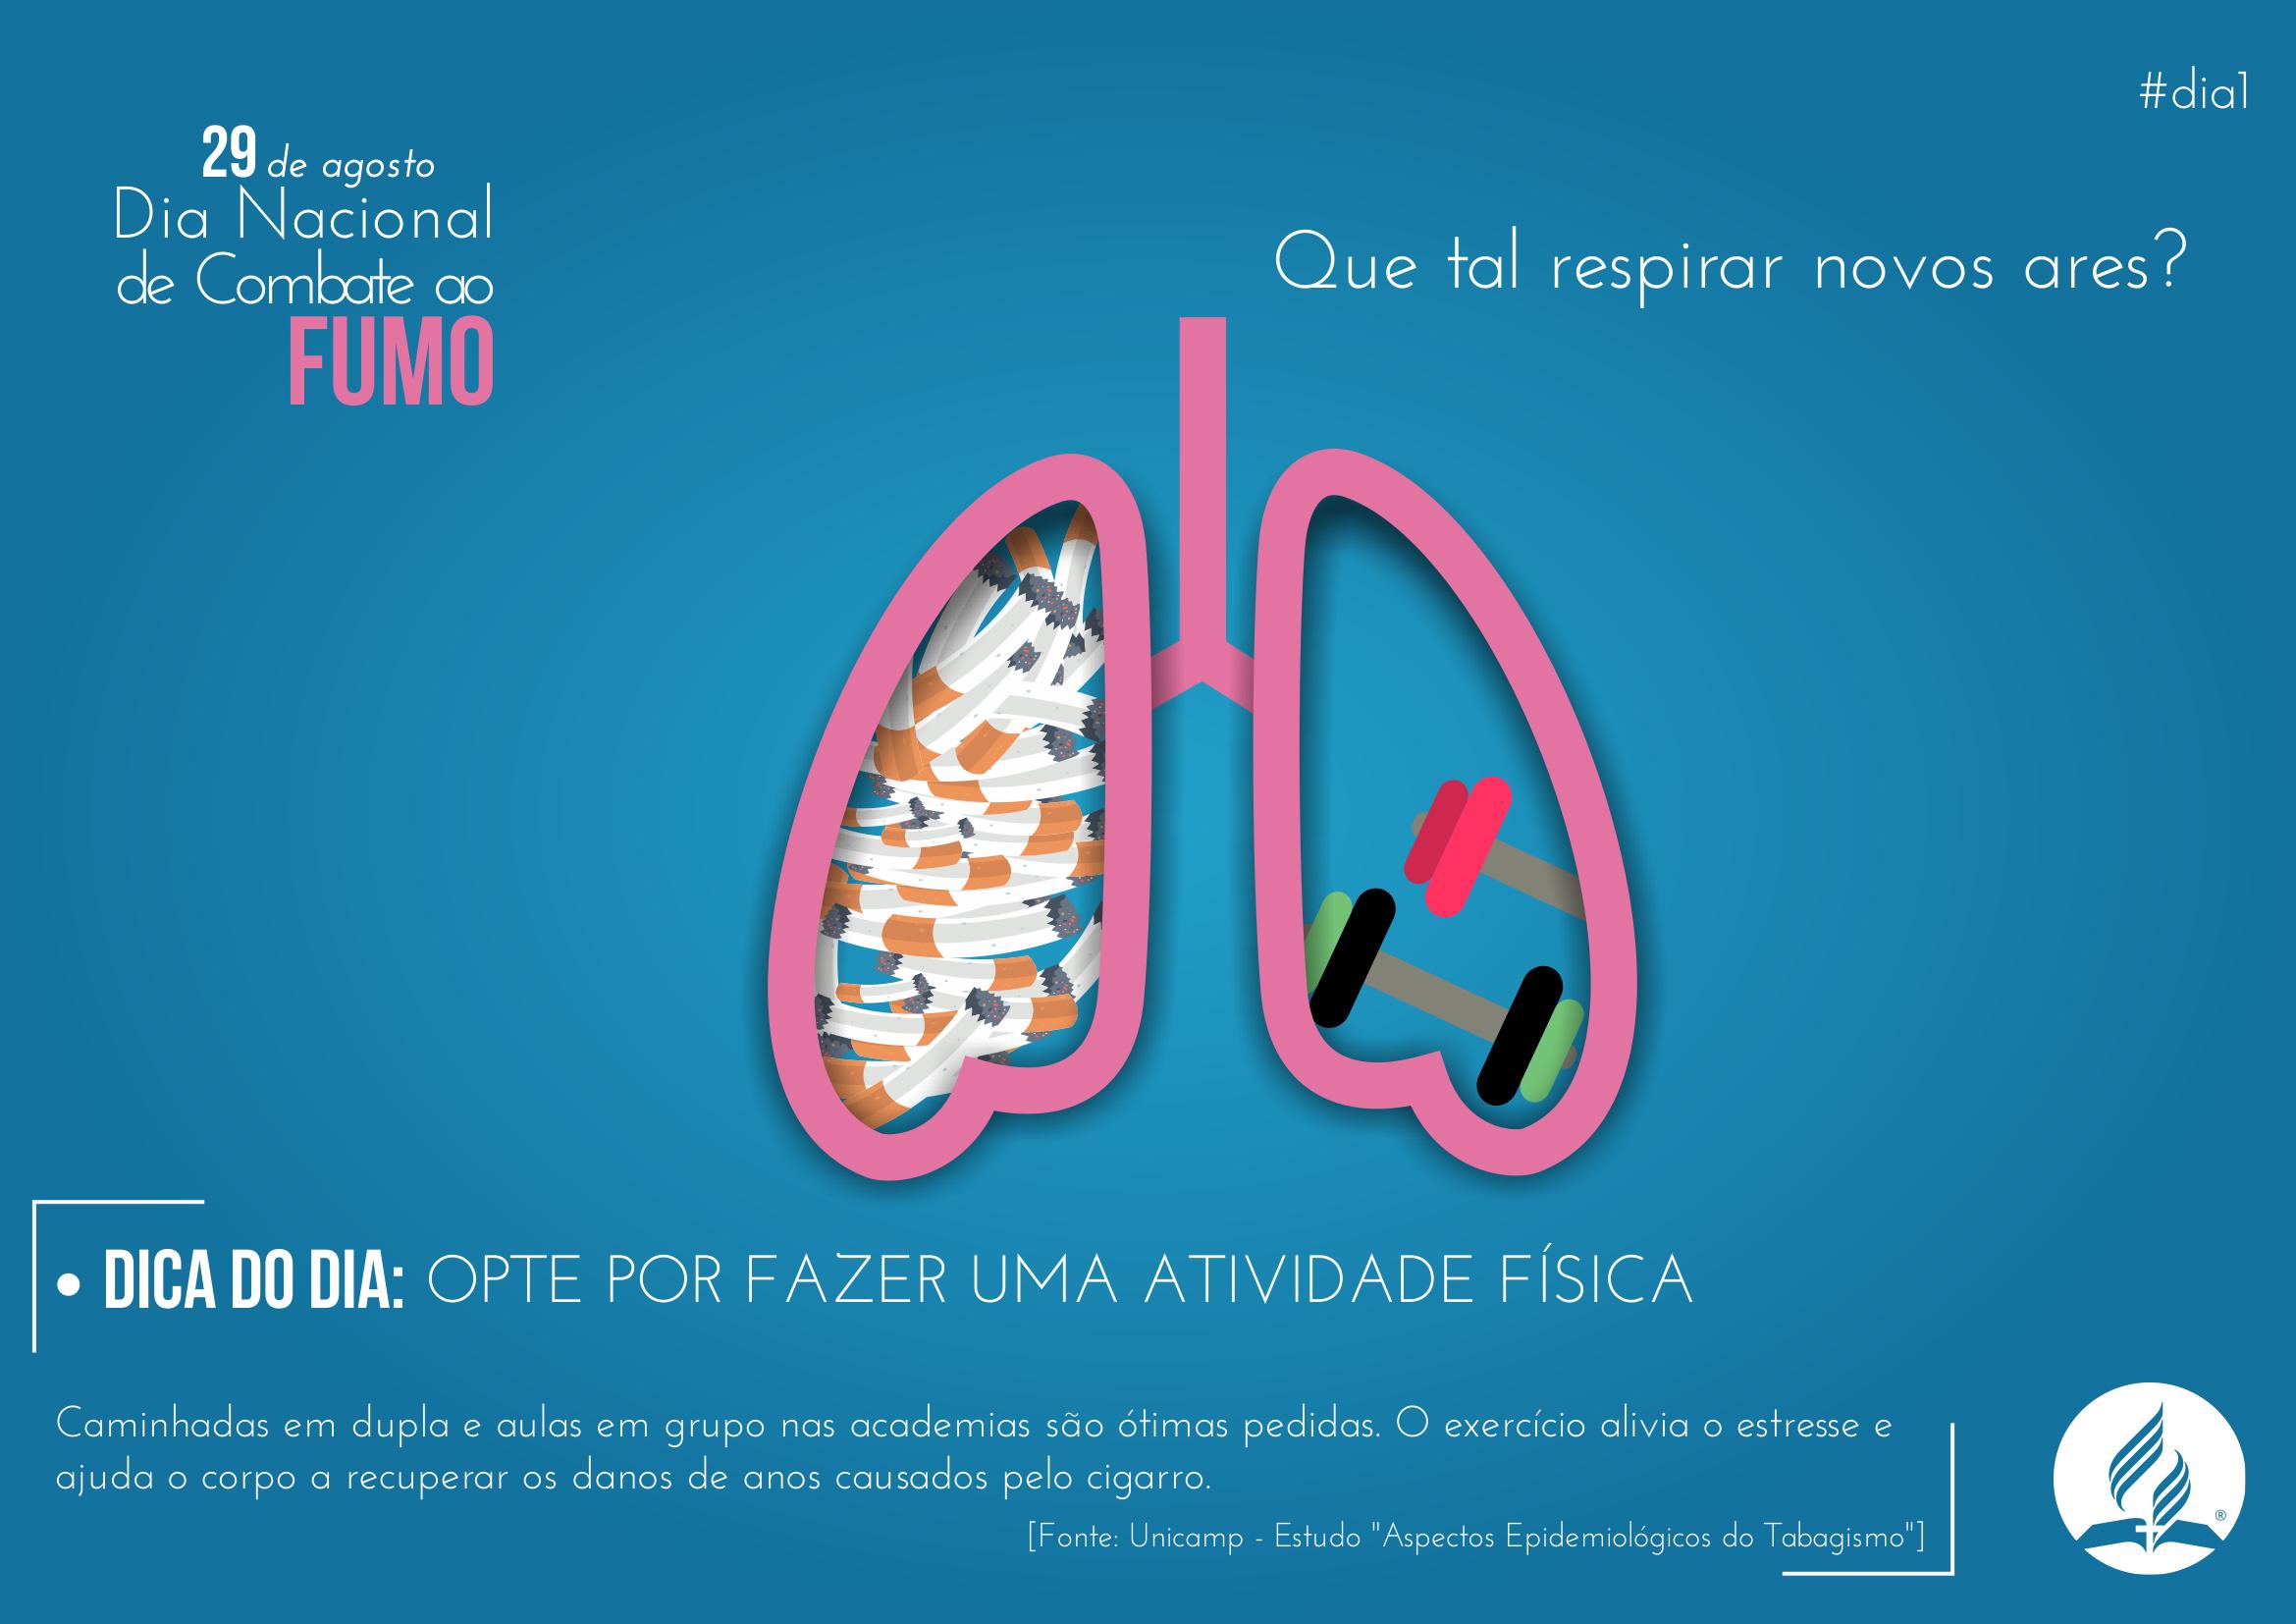 dica1 parar de fumar